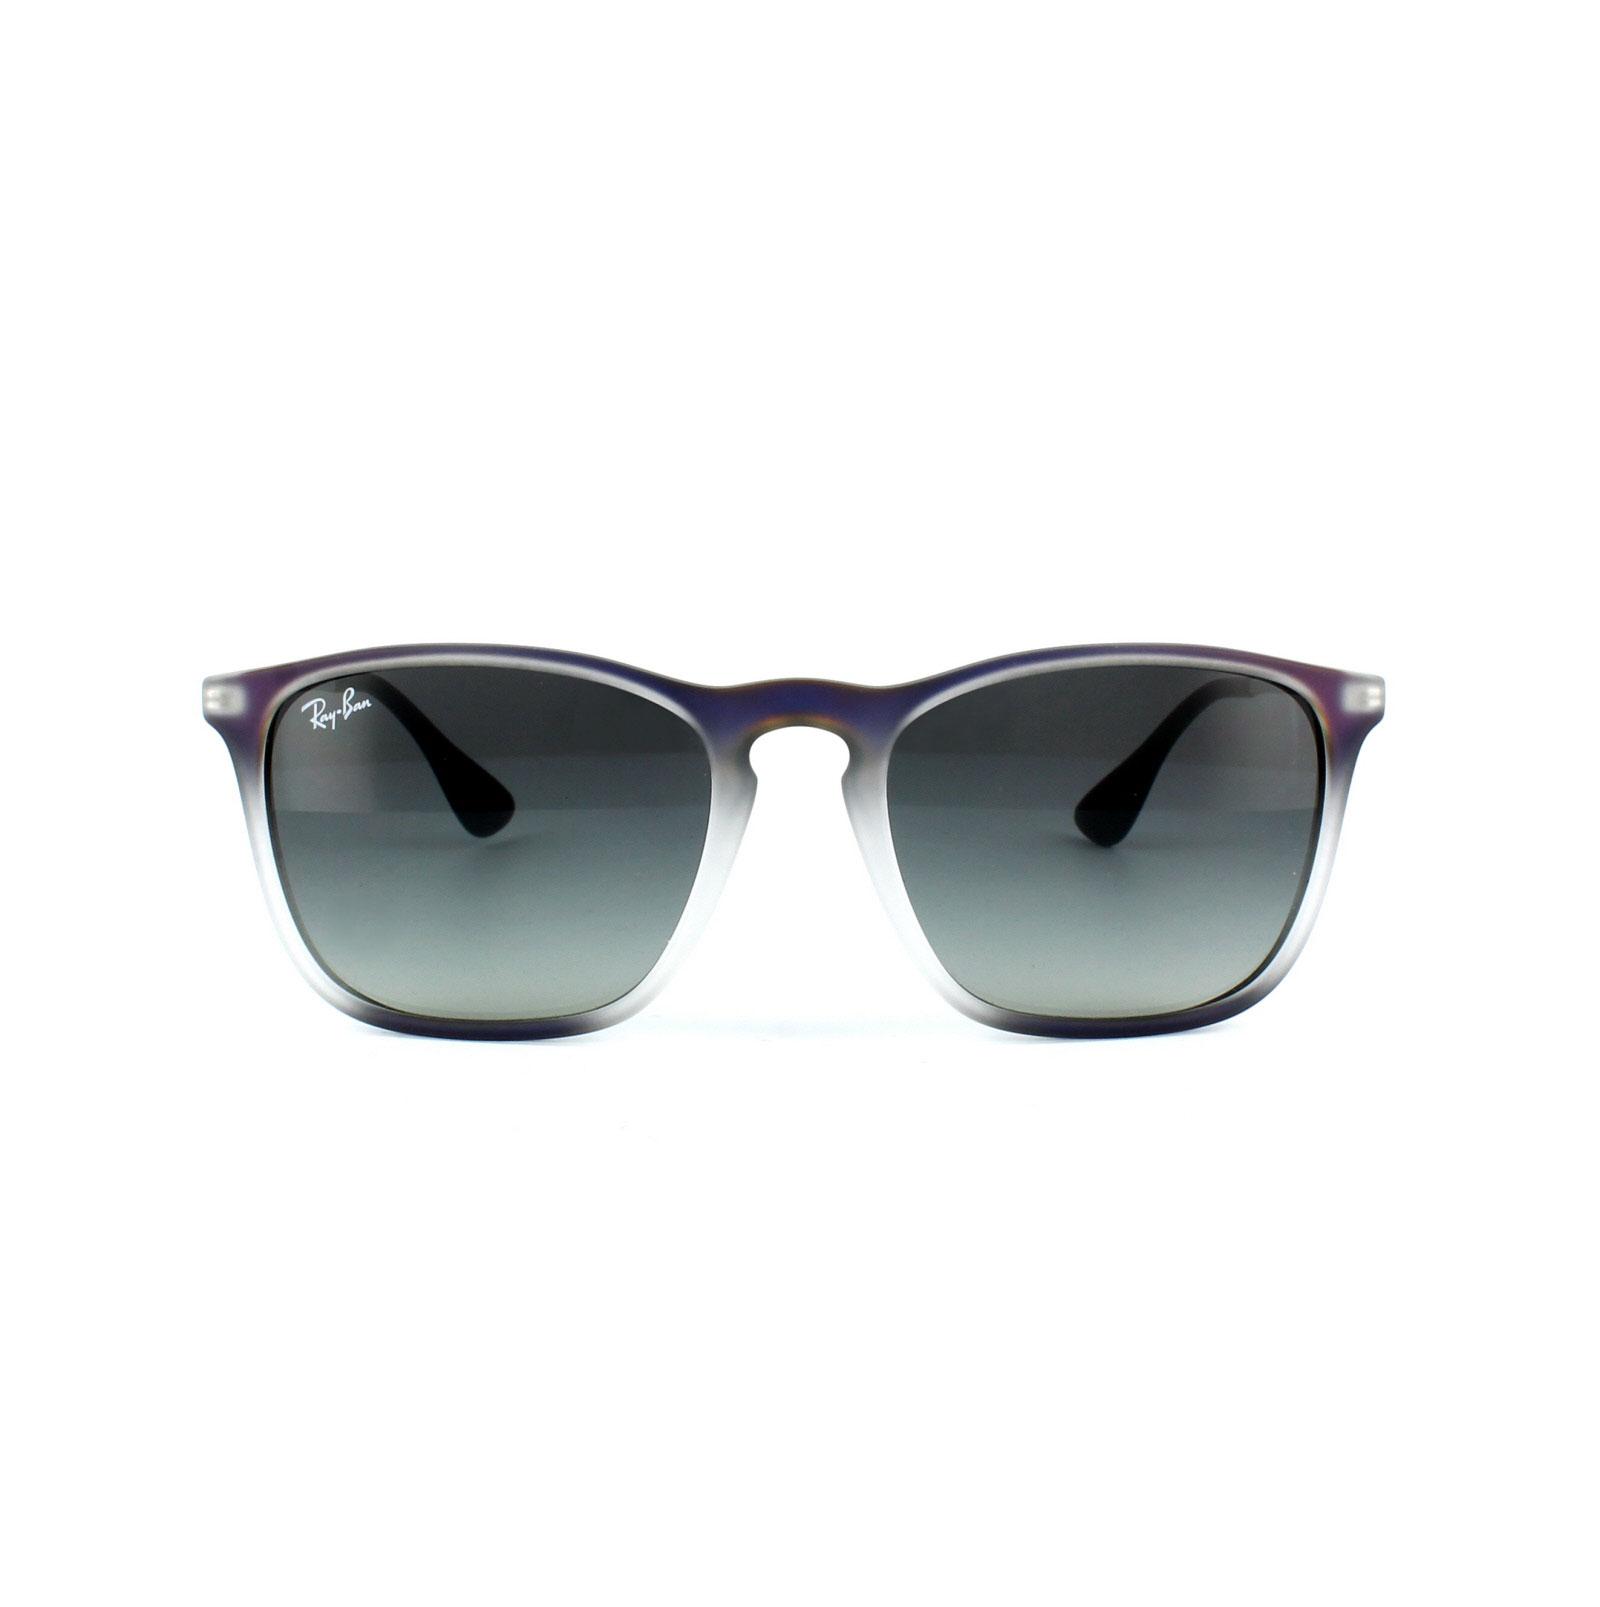 ca570a931f Sentinel Ray-Ban Sunglasses Chris 4187 622311 Violet   Grey Grey Gradient